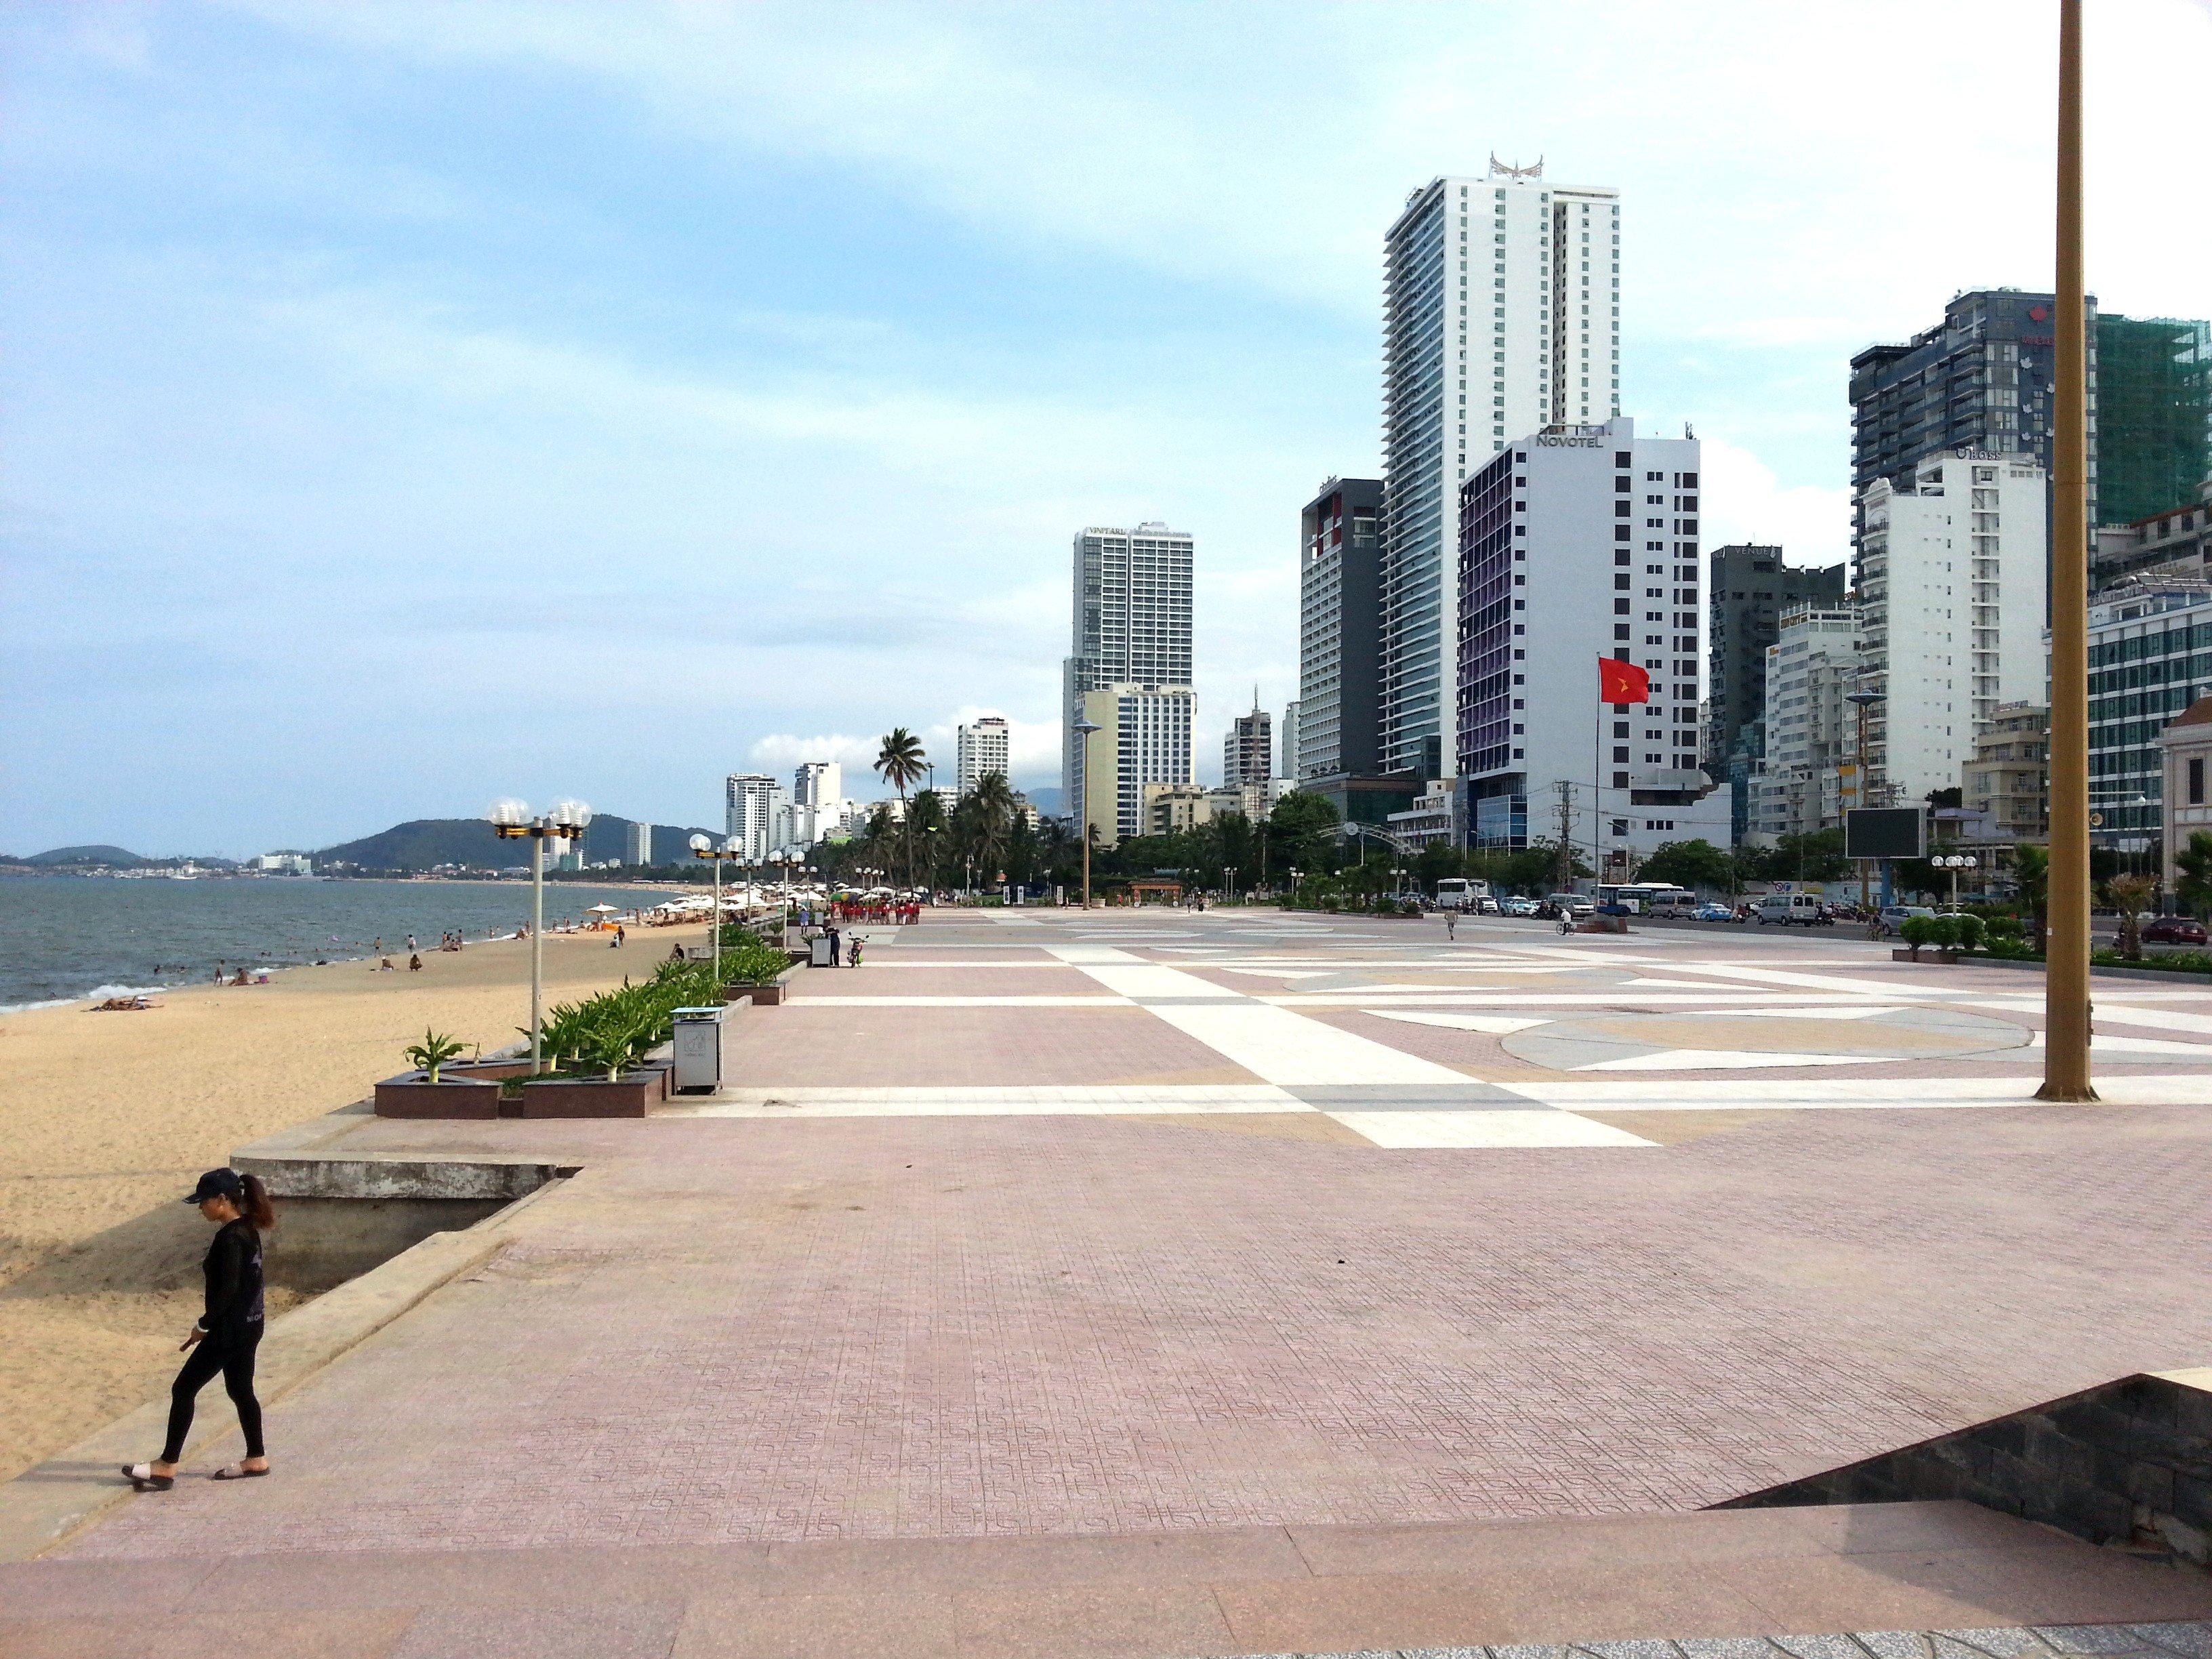 Public plaza on Nha Trang Beach